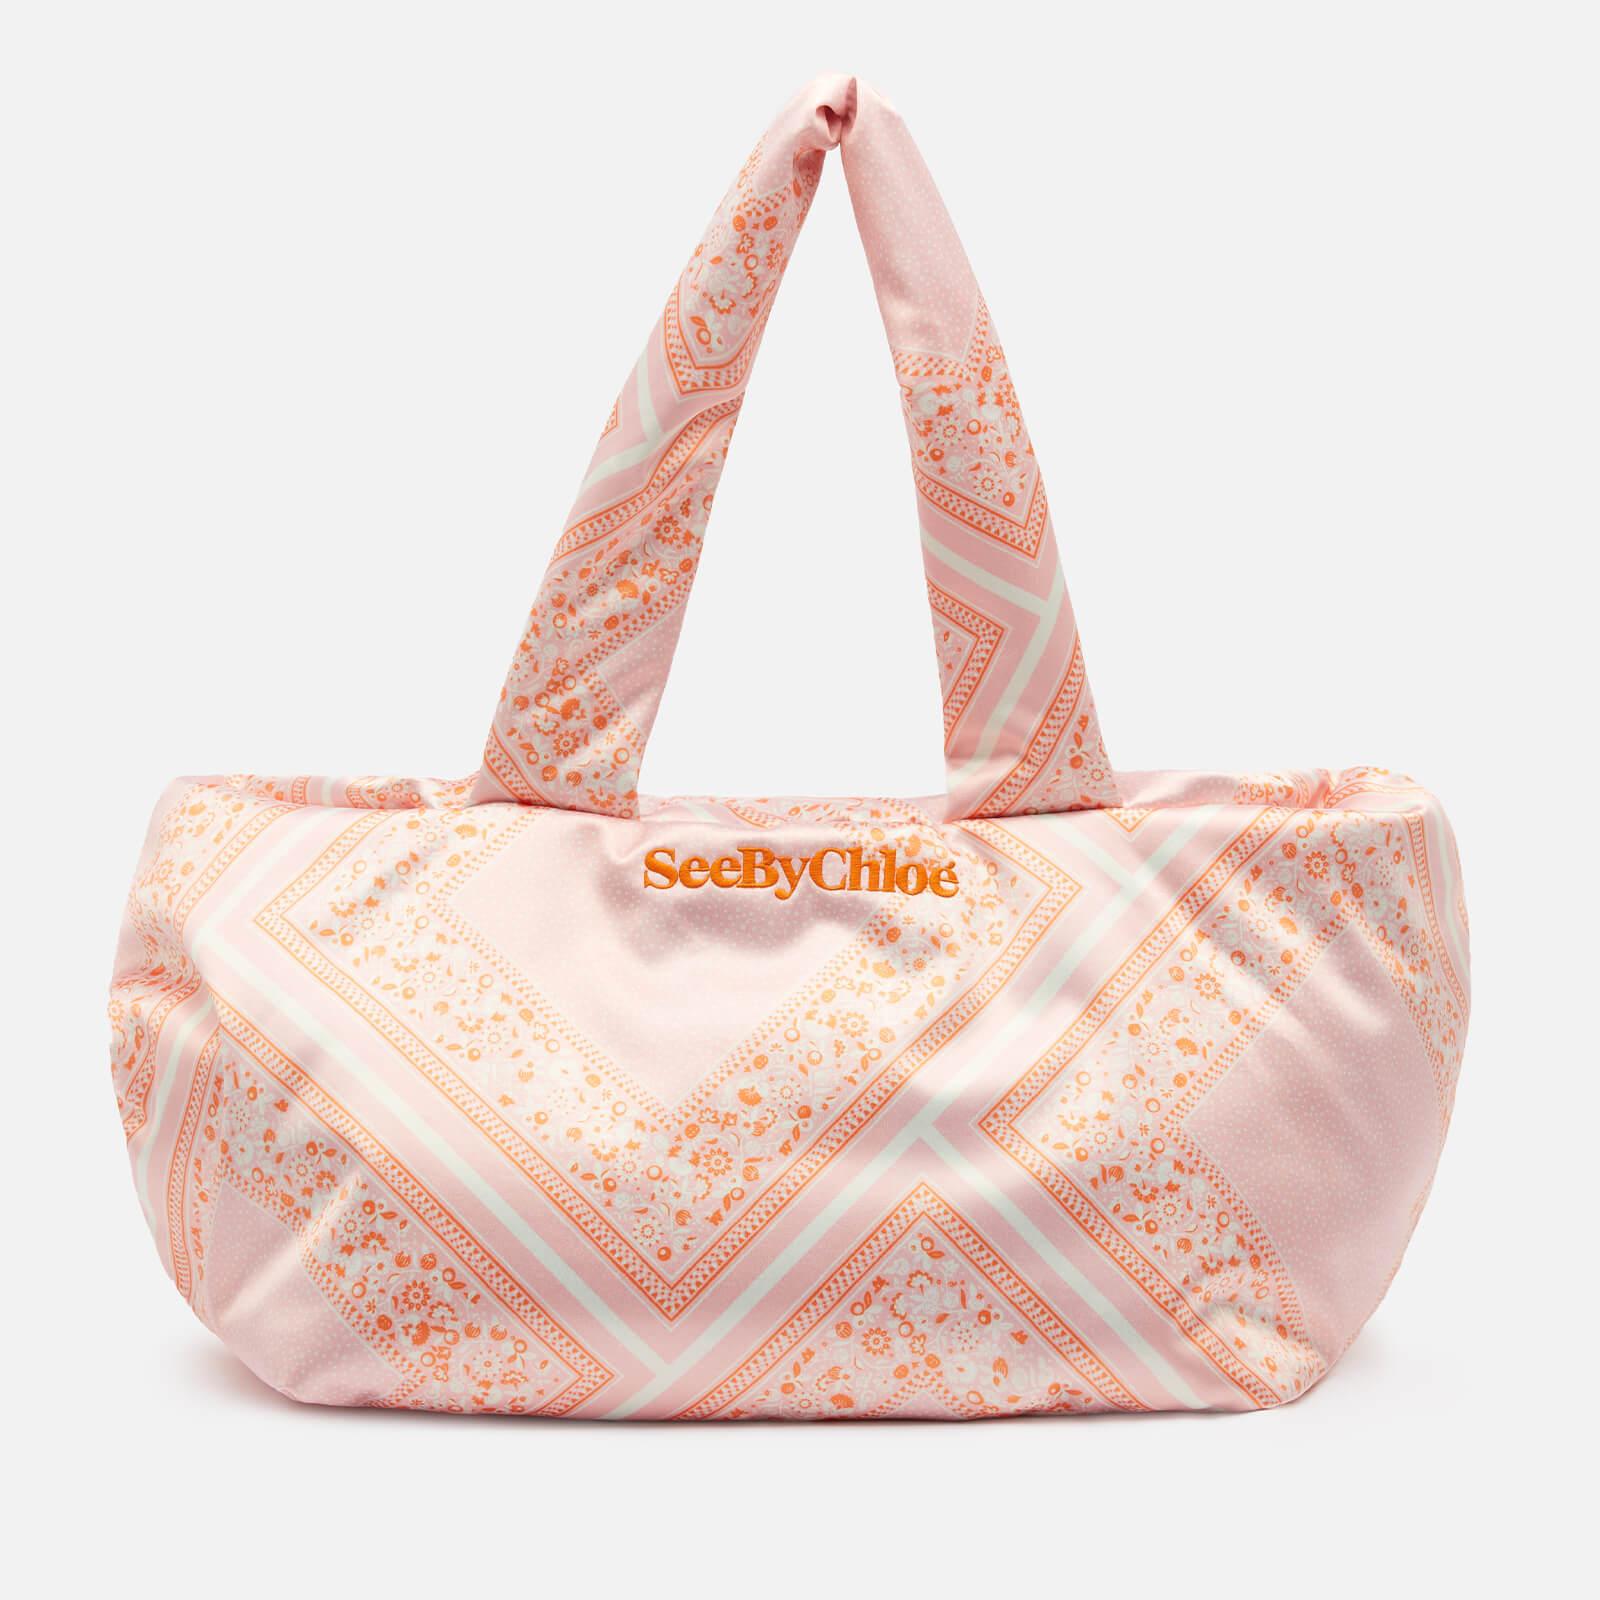 See by Chloé Women's Tilly Bandana Print Tote Bag - Fallow Pink